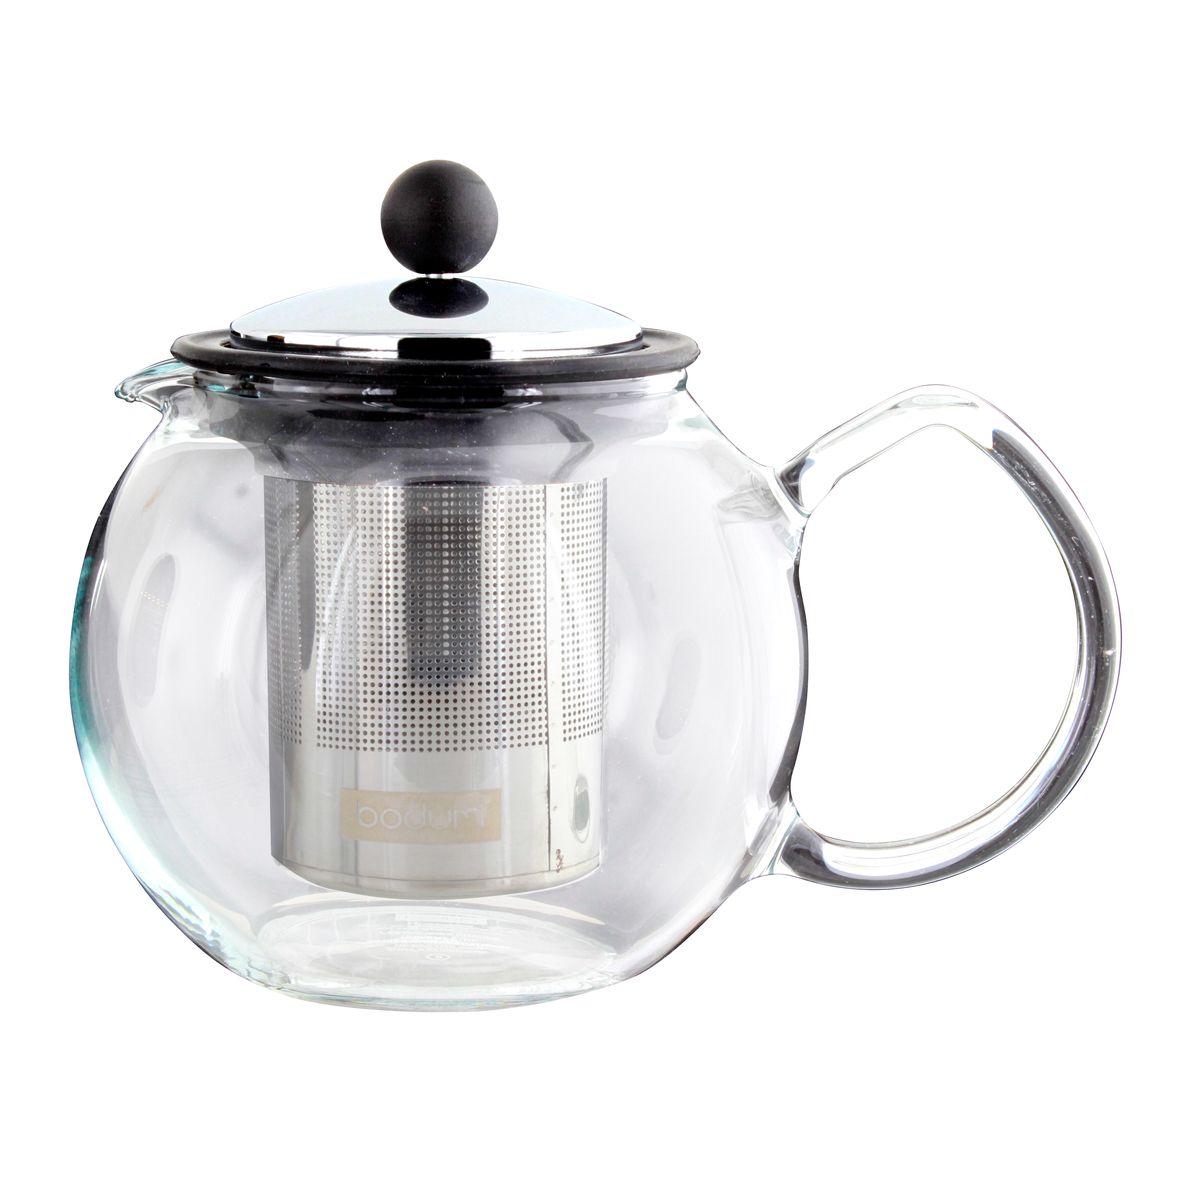 Théière Assam 0.5l filtre inox - Bodum